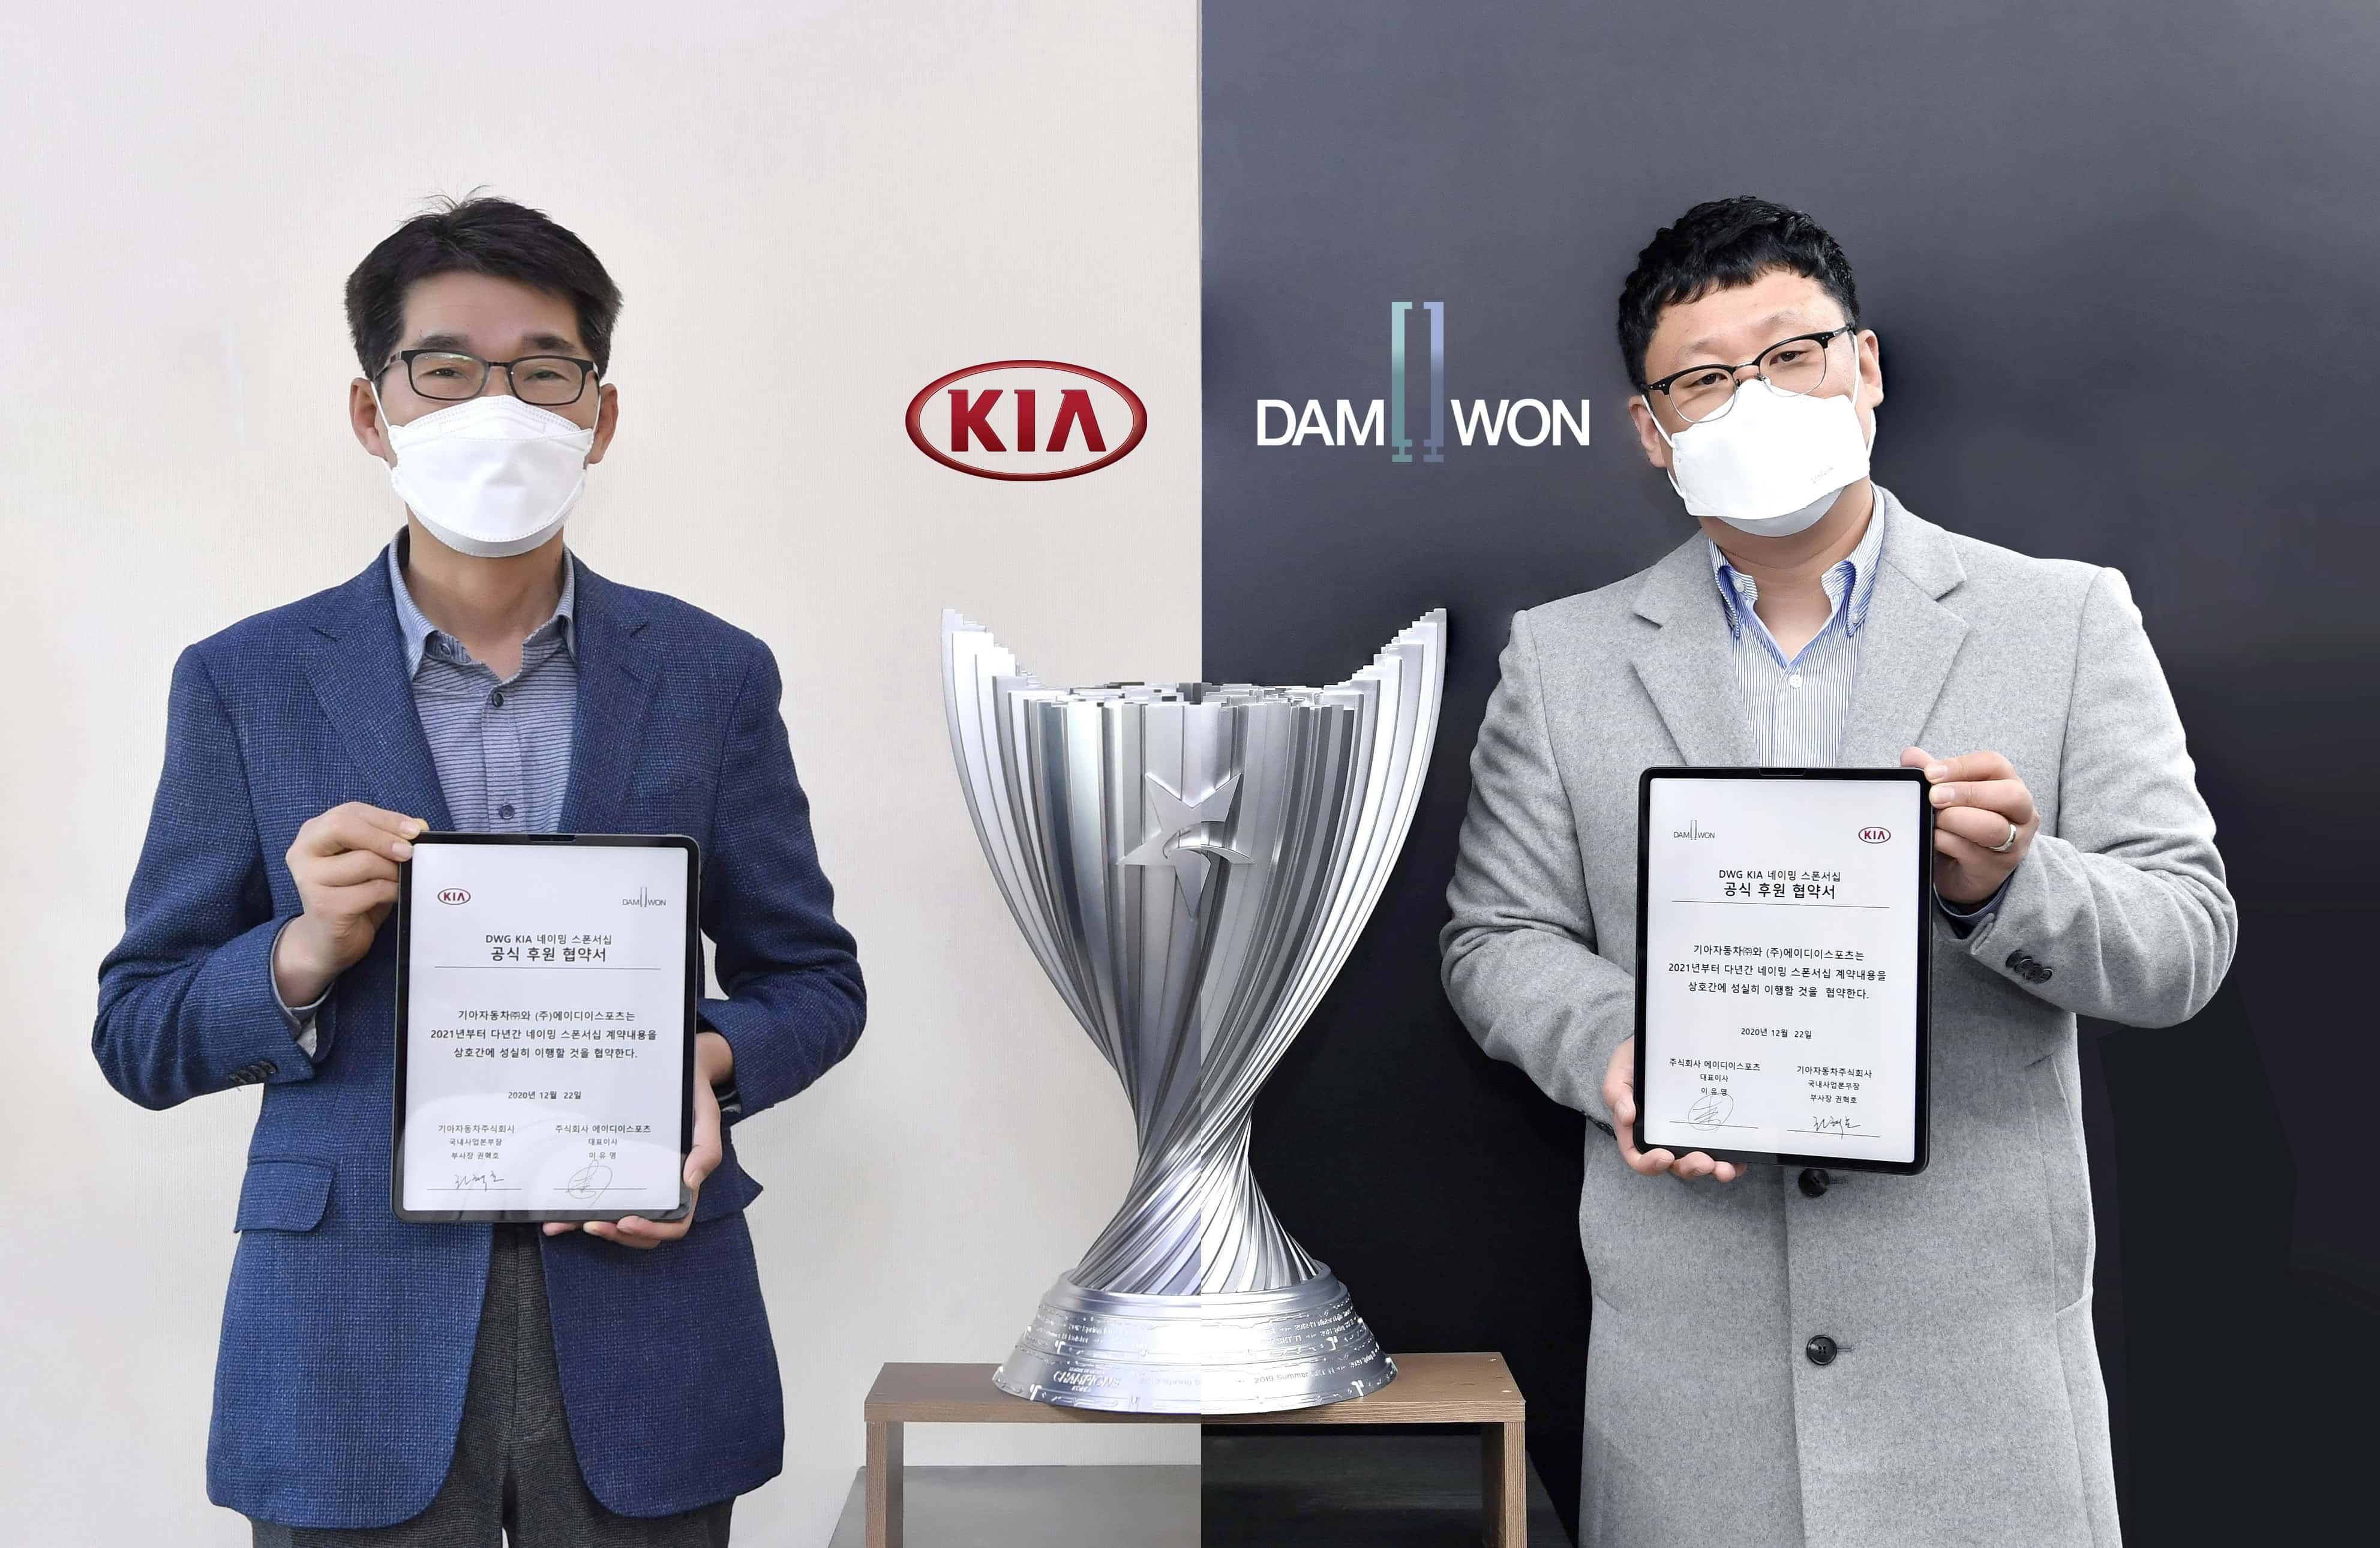 KIA SPONSORS 2020 LEAGUE OF LEGENDS WORLD CHAMPIONS DAMWON GAMING